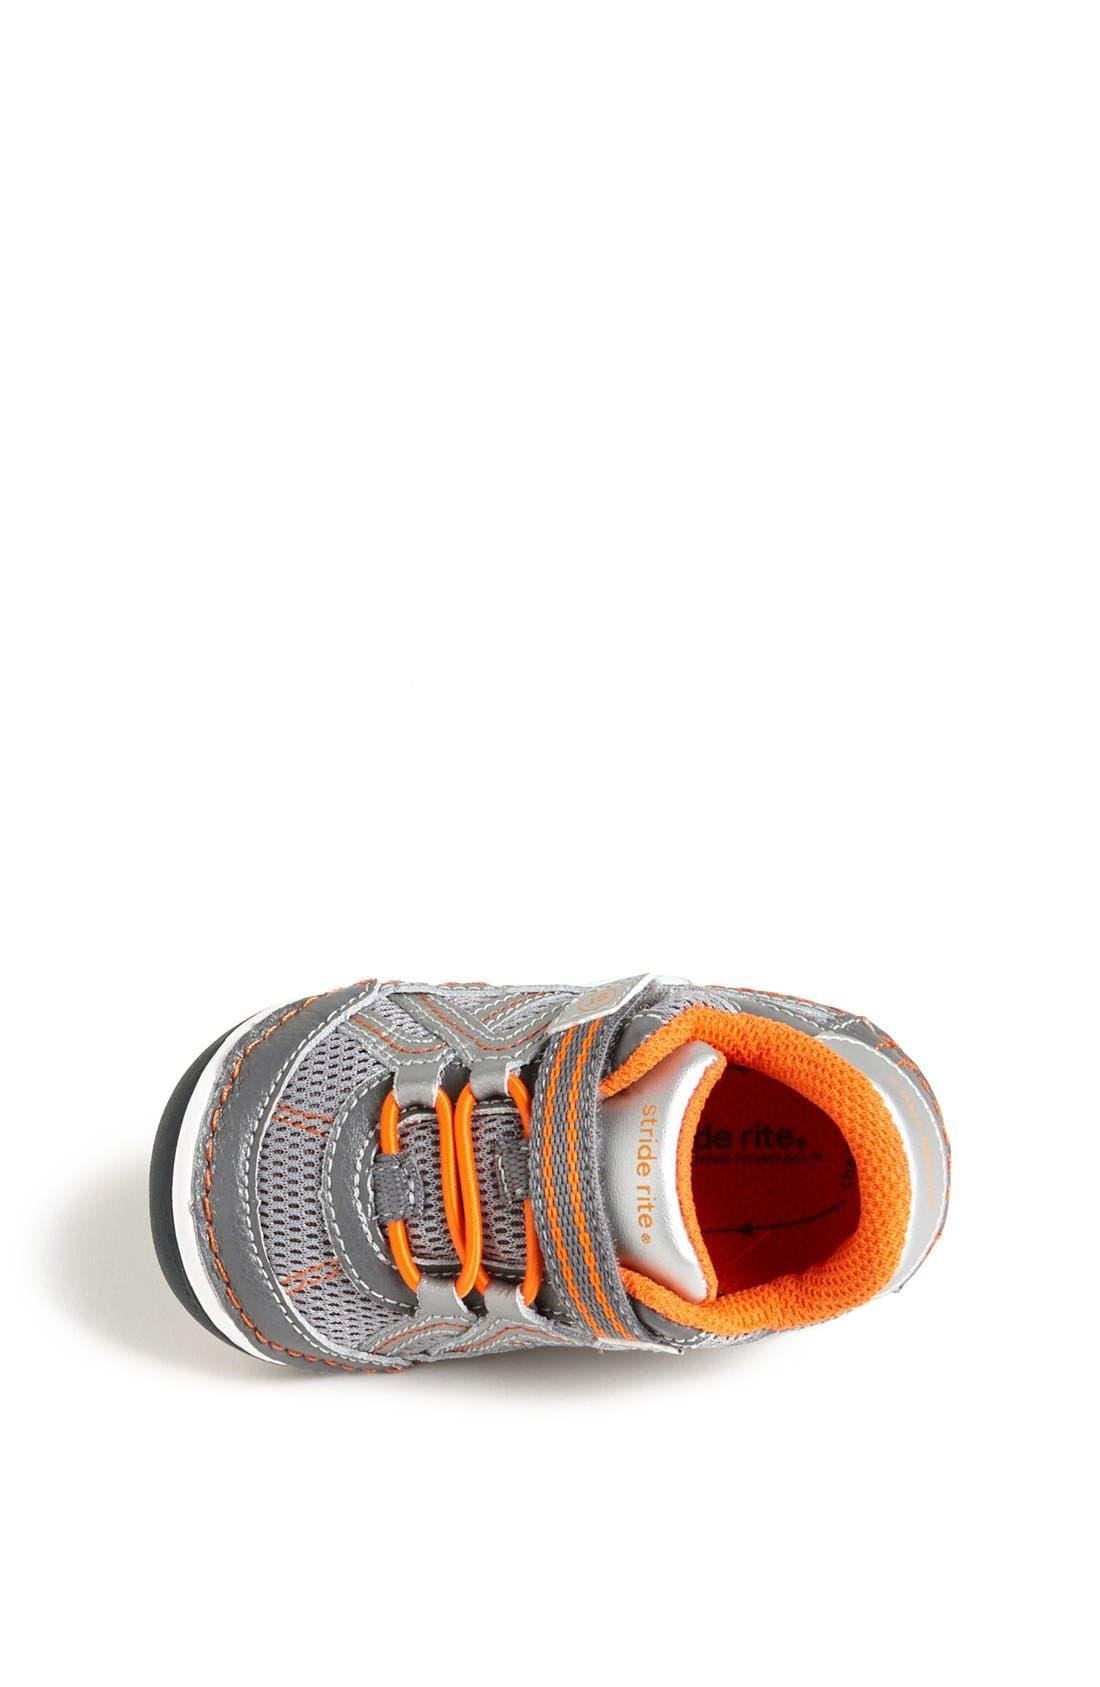 Alternate Image 3  - Stride Rite 'Damien' Sneaker (Baby & Walker)